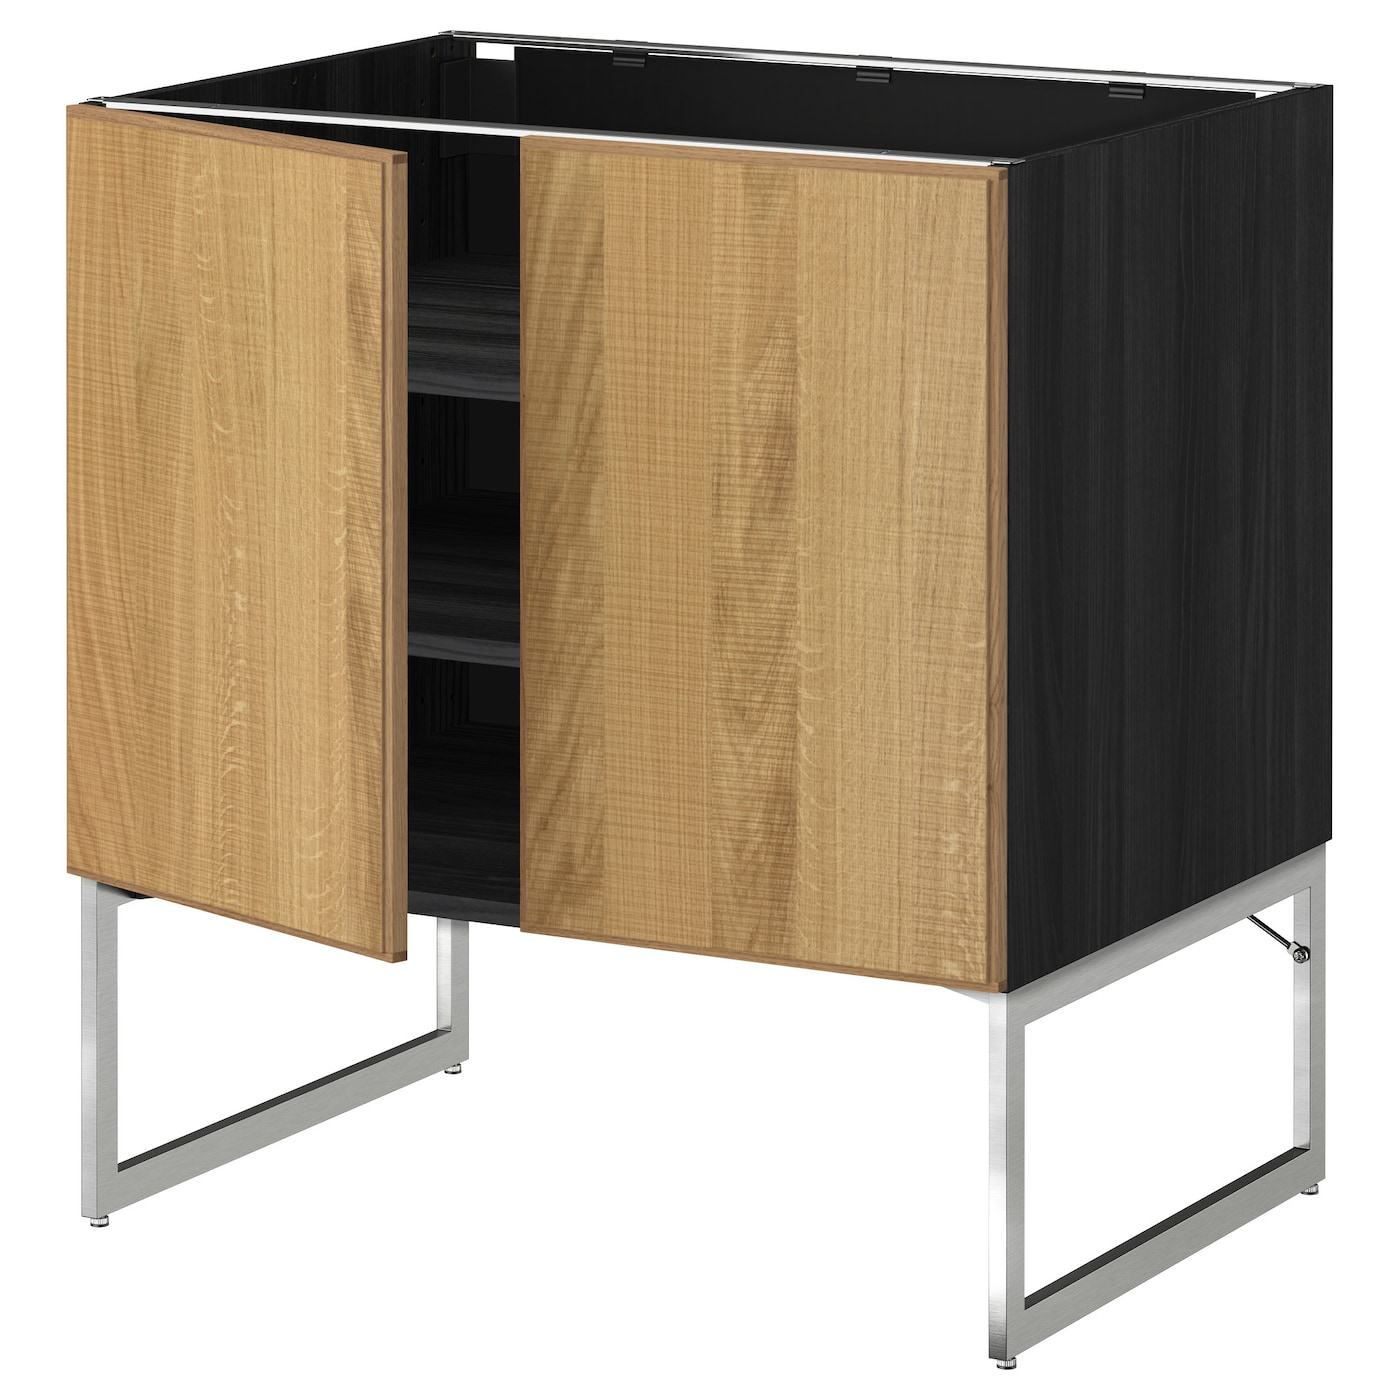 onderkast keukenkasten ikea. Black Bedroom Furniture Sets. Home Design Ideas